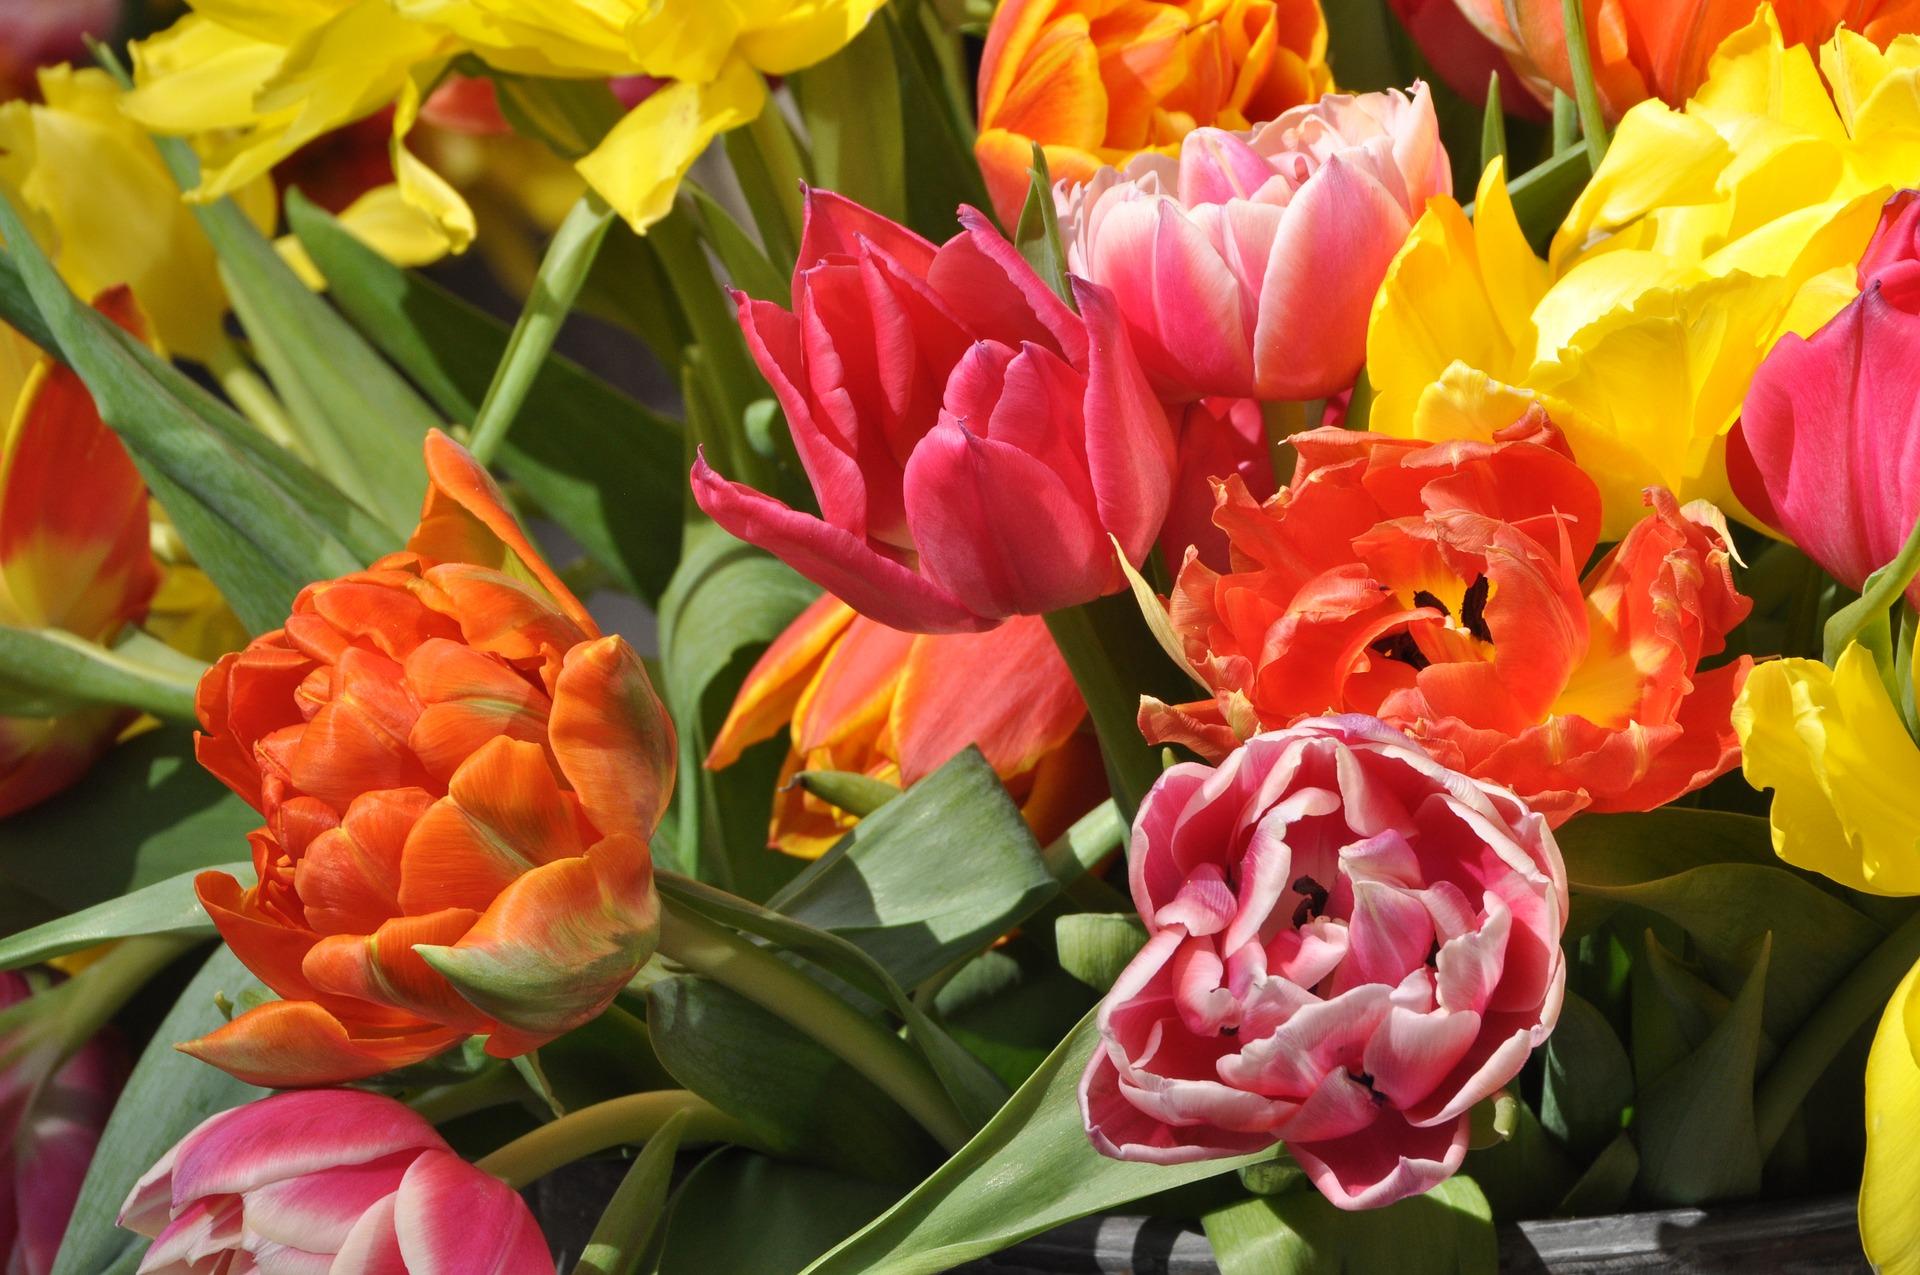 tulip-3331601_1920.jpg